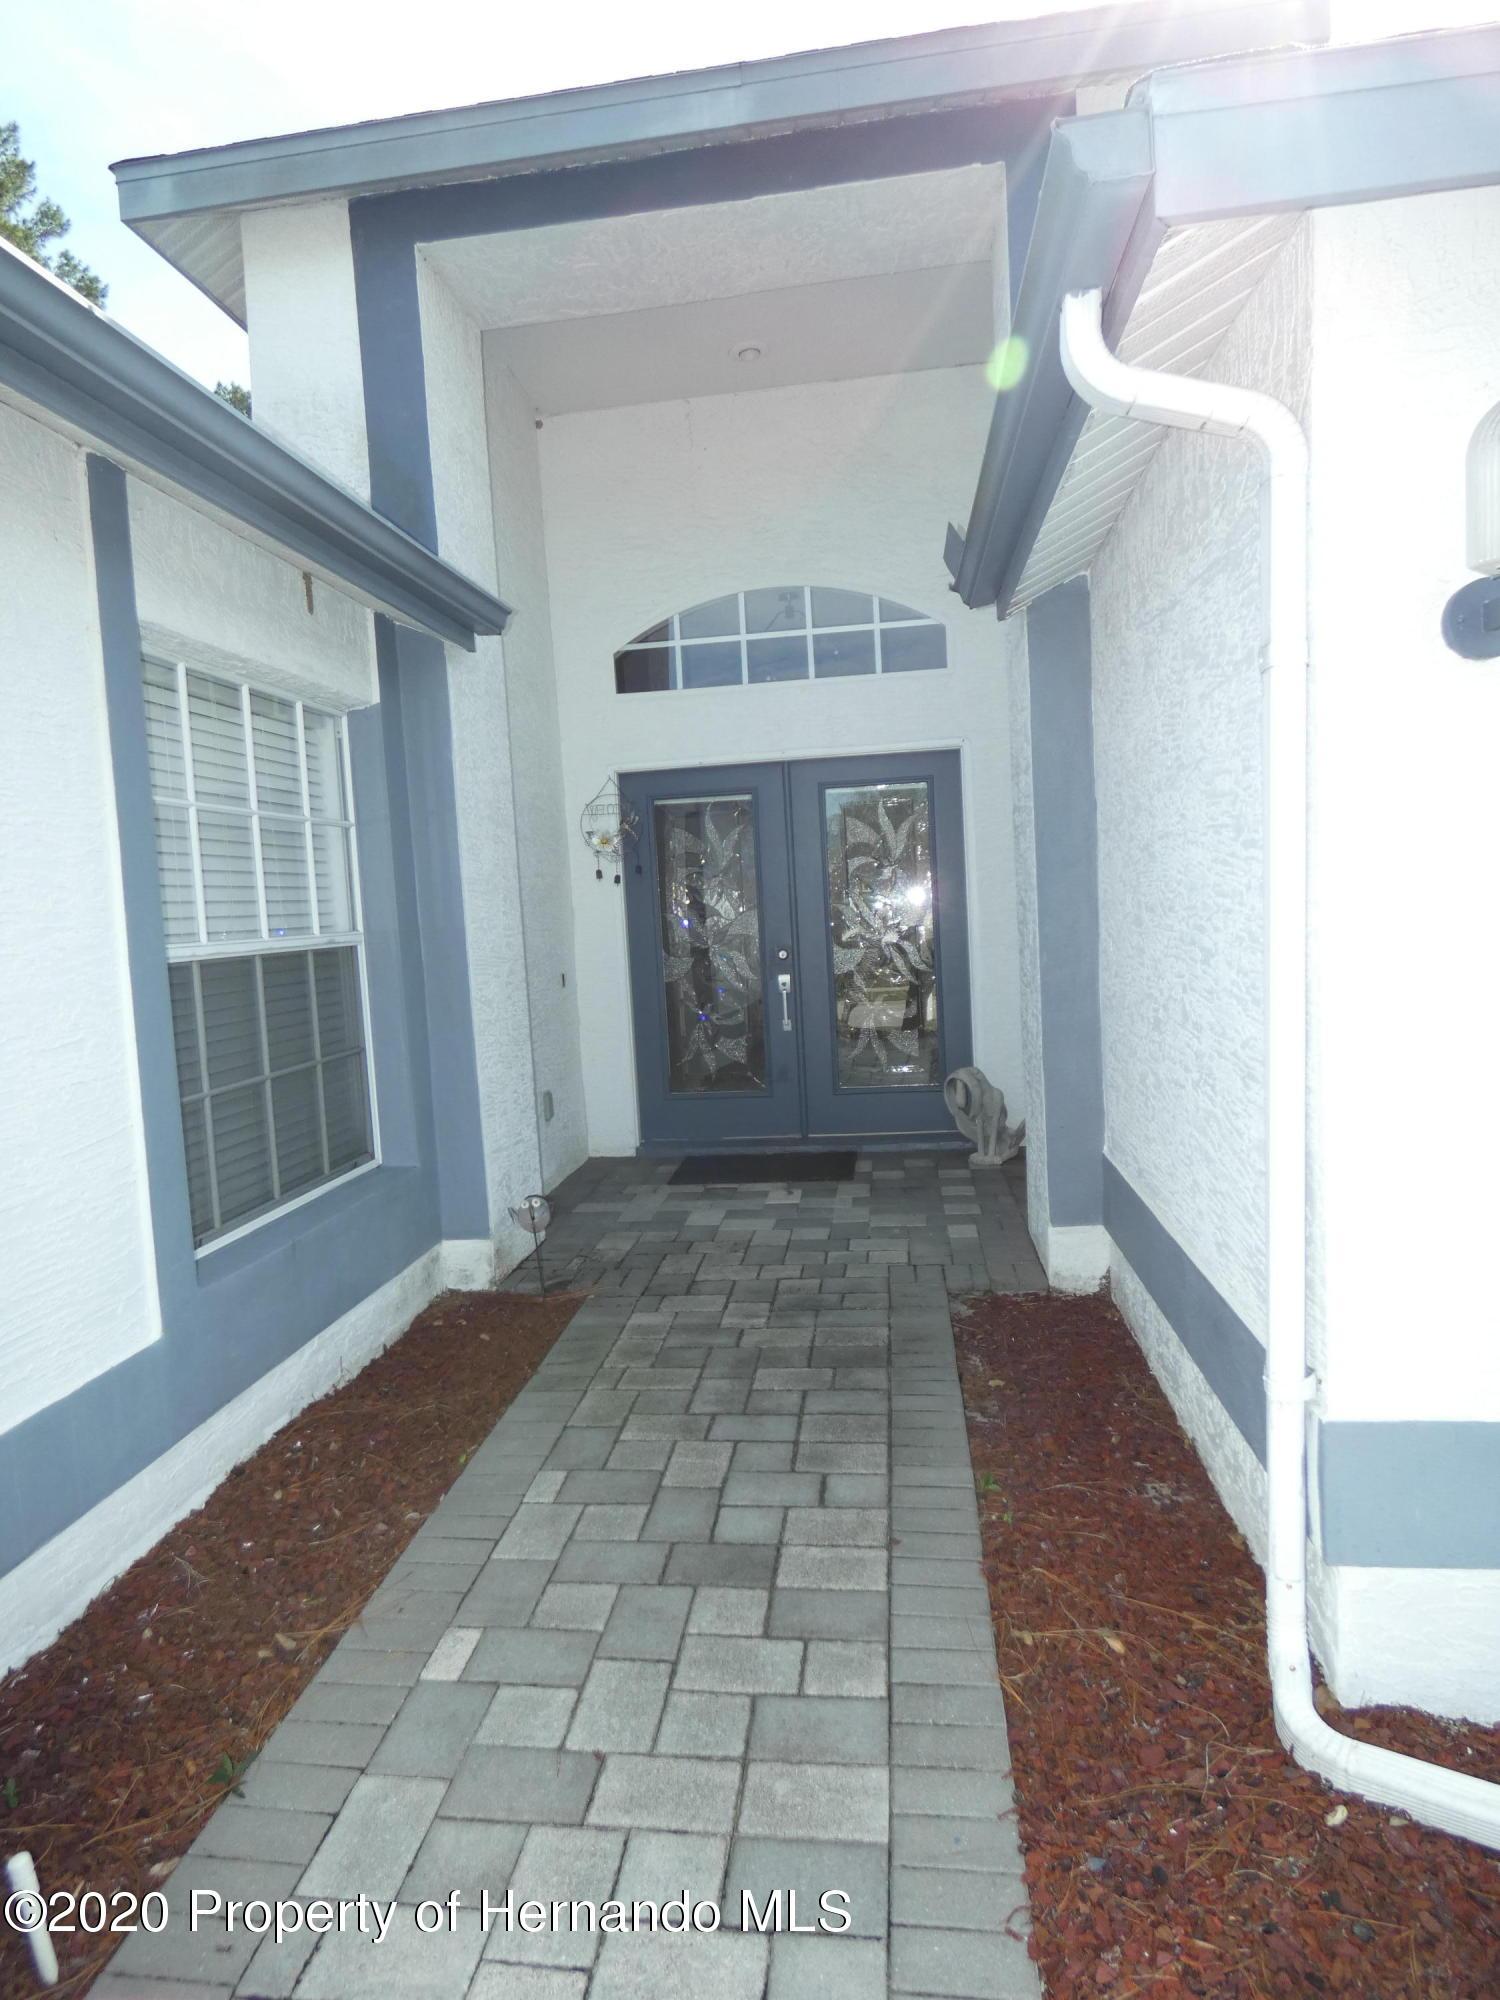 Details for 10416 Countrywood Lane, Hudson, FL 34667